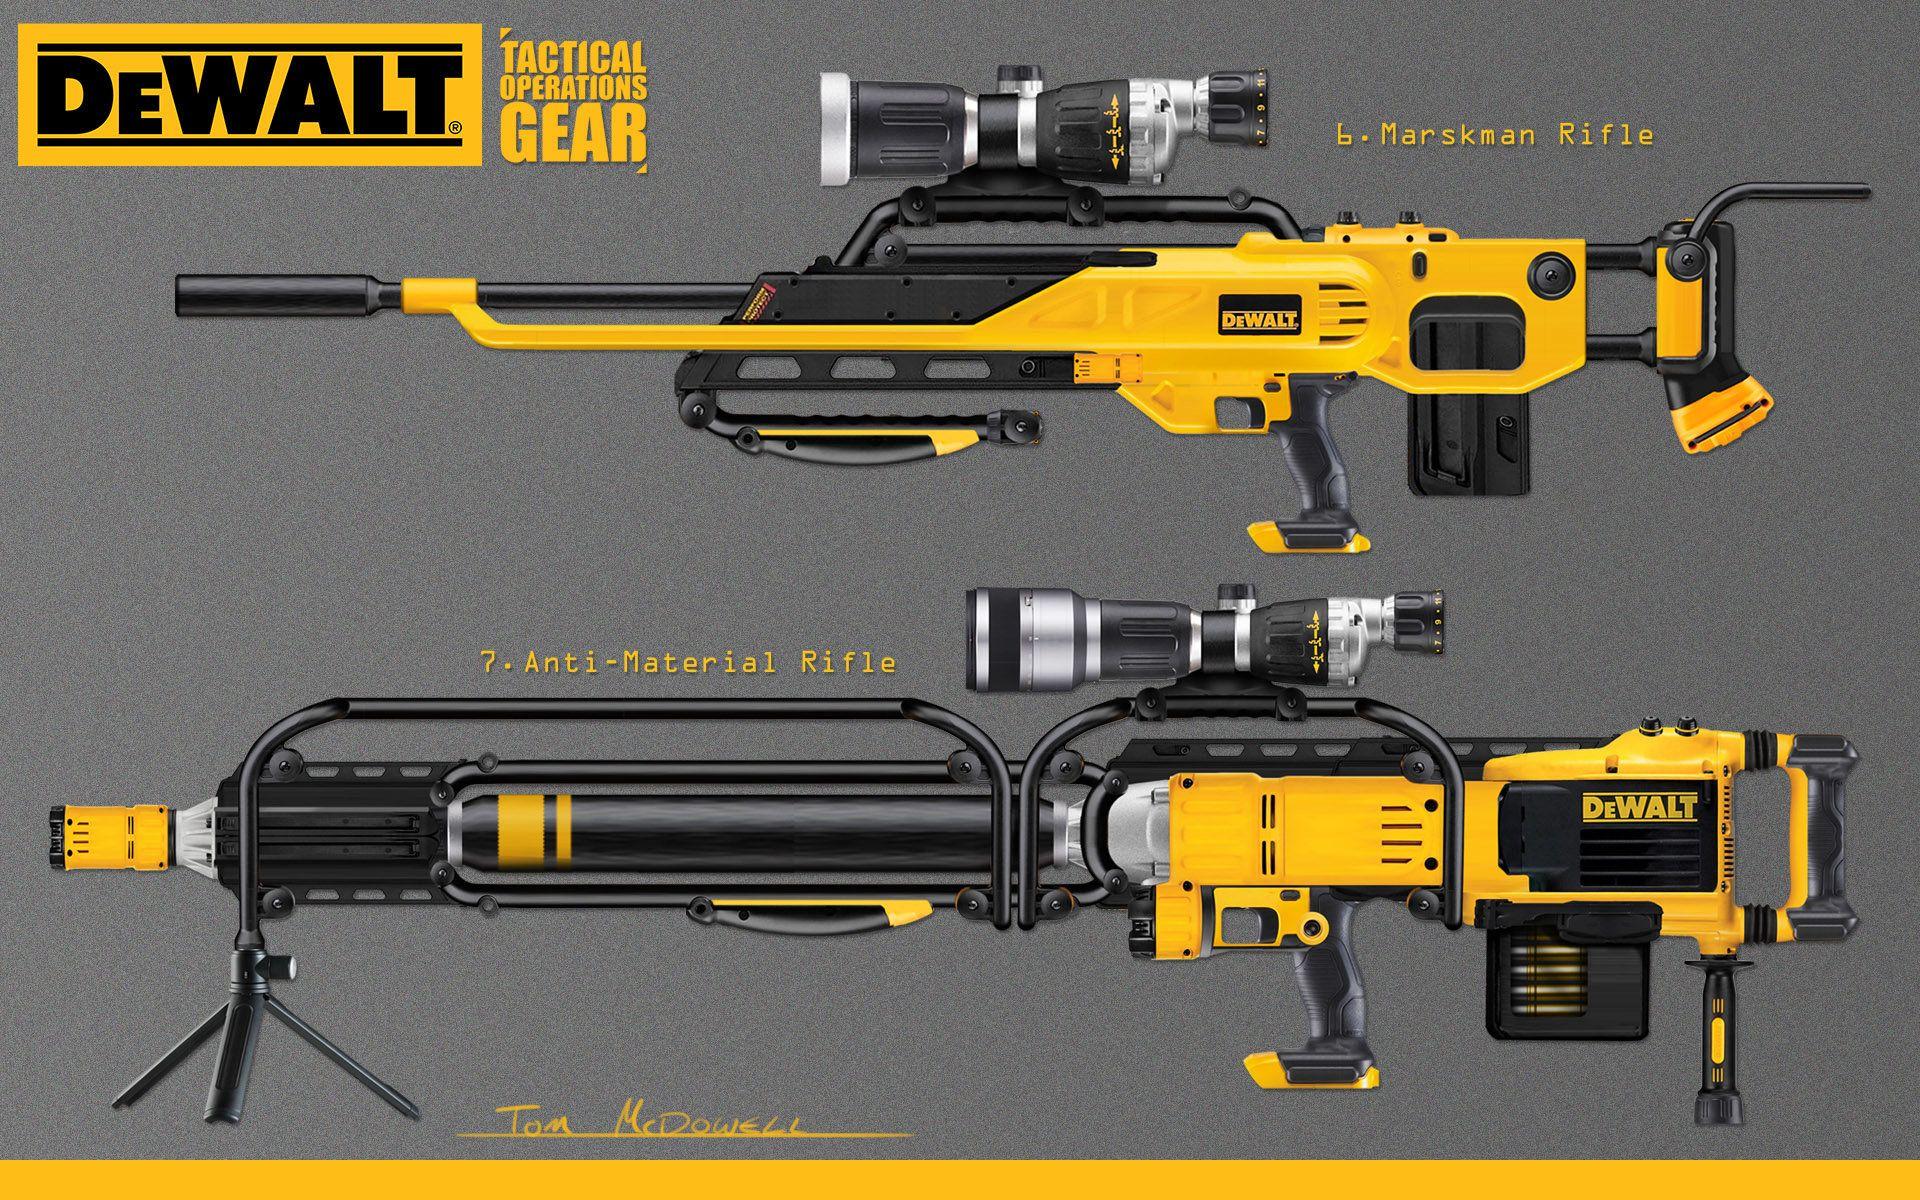 ArtStation - DeWalt Guns, Tom McDowell | Guns & Ammo | Pinterest ...